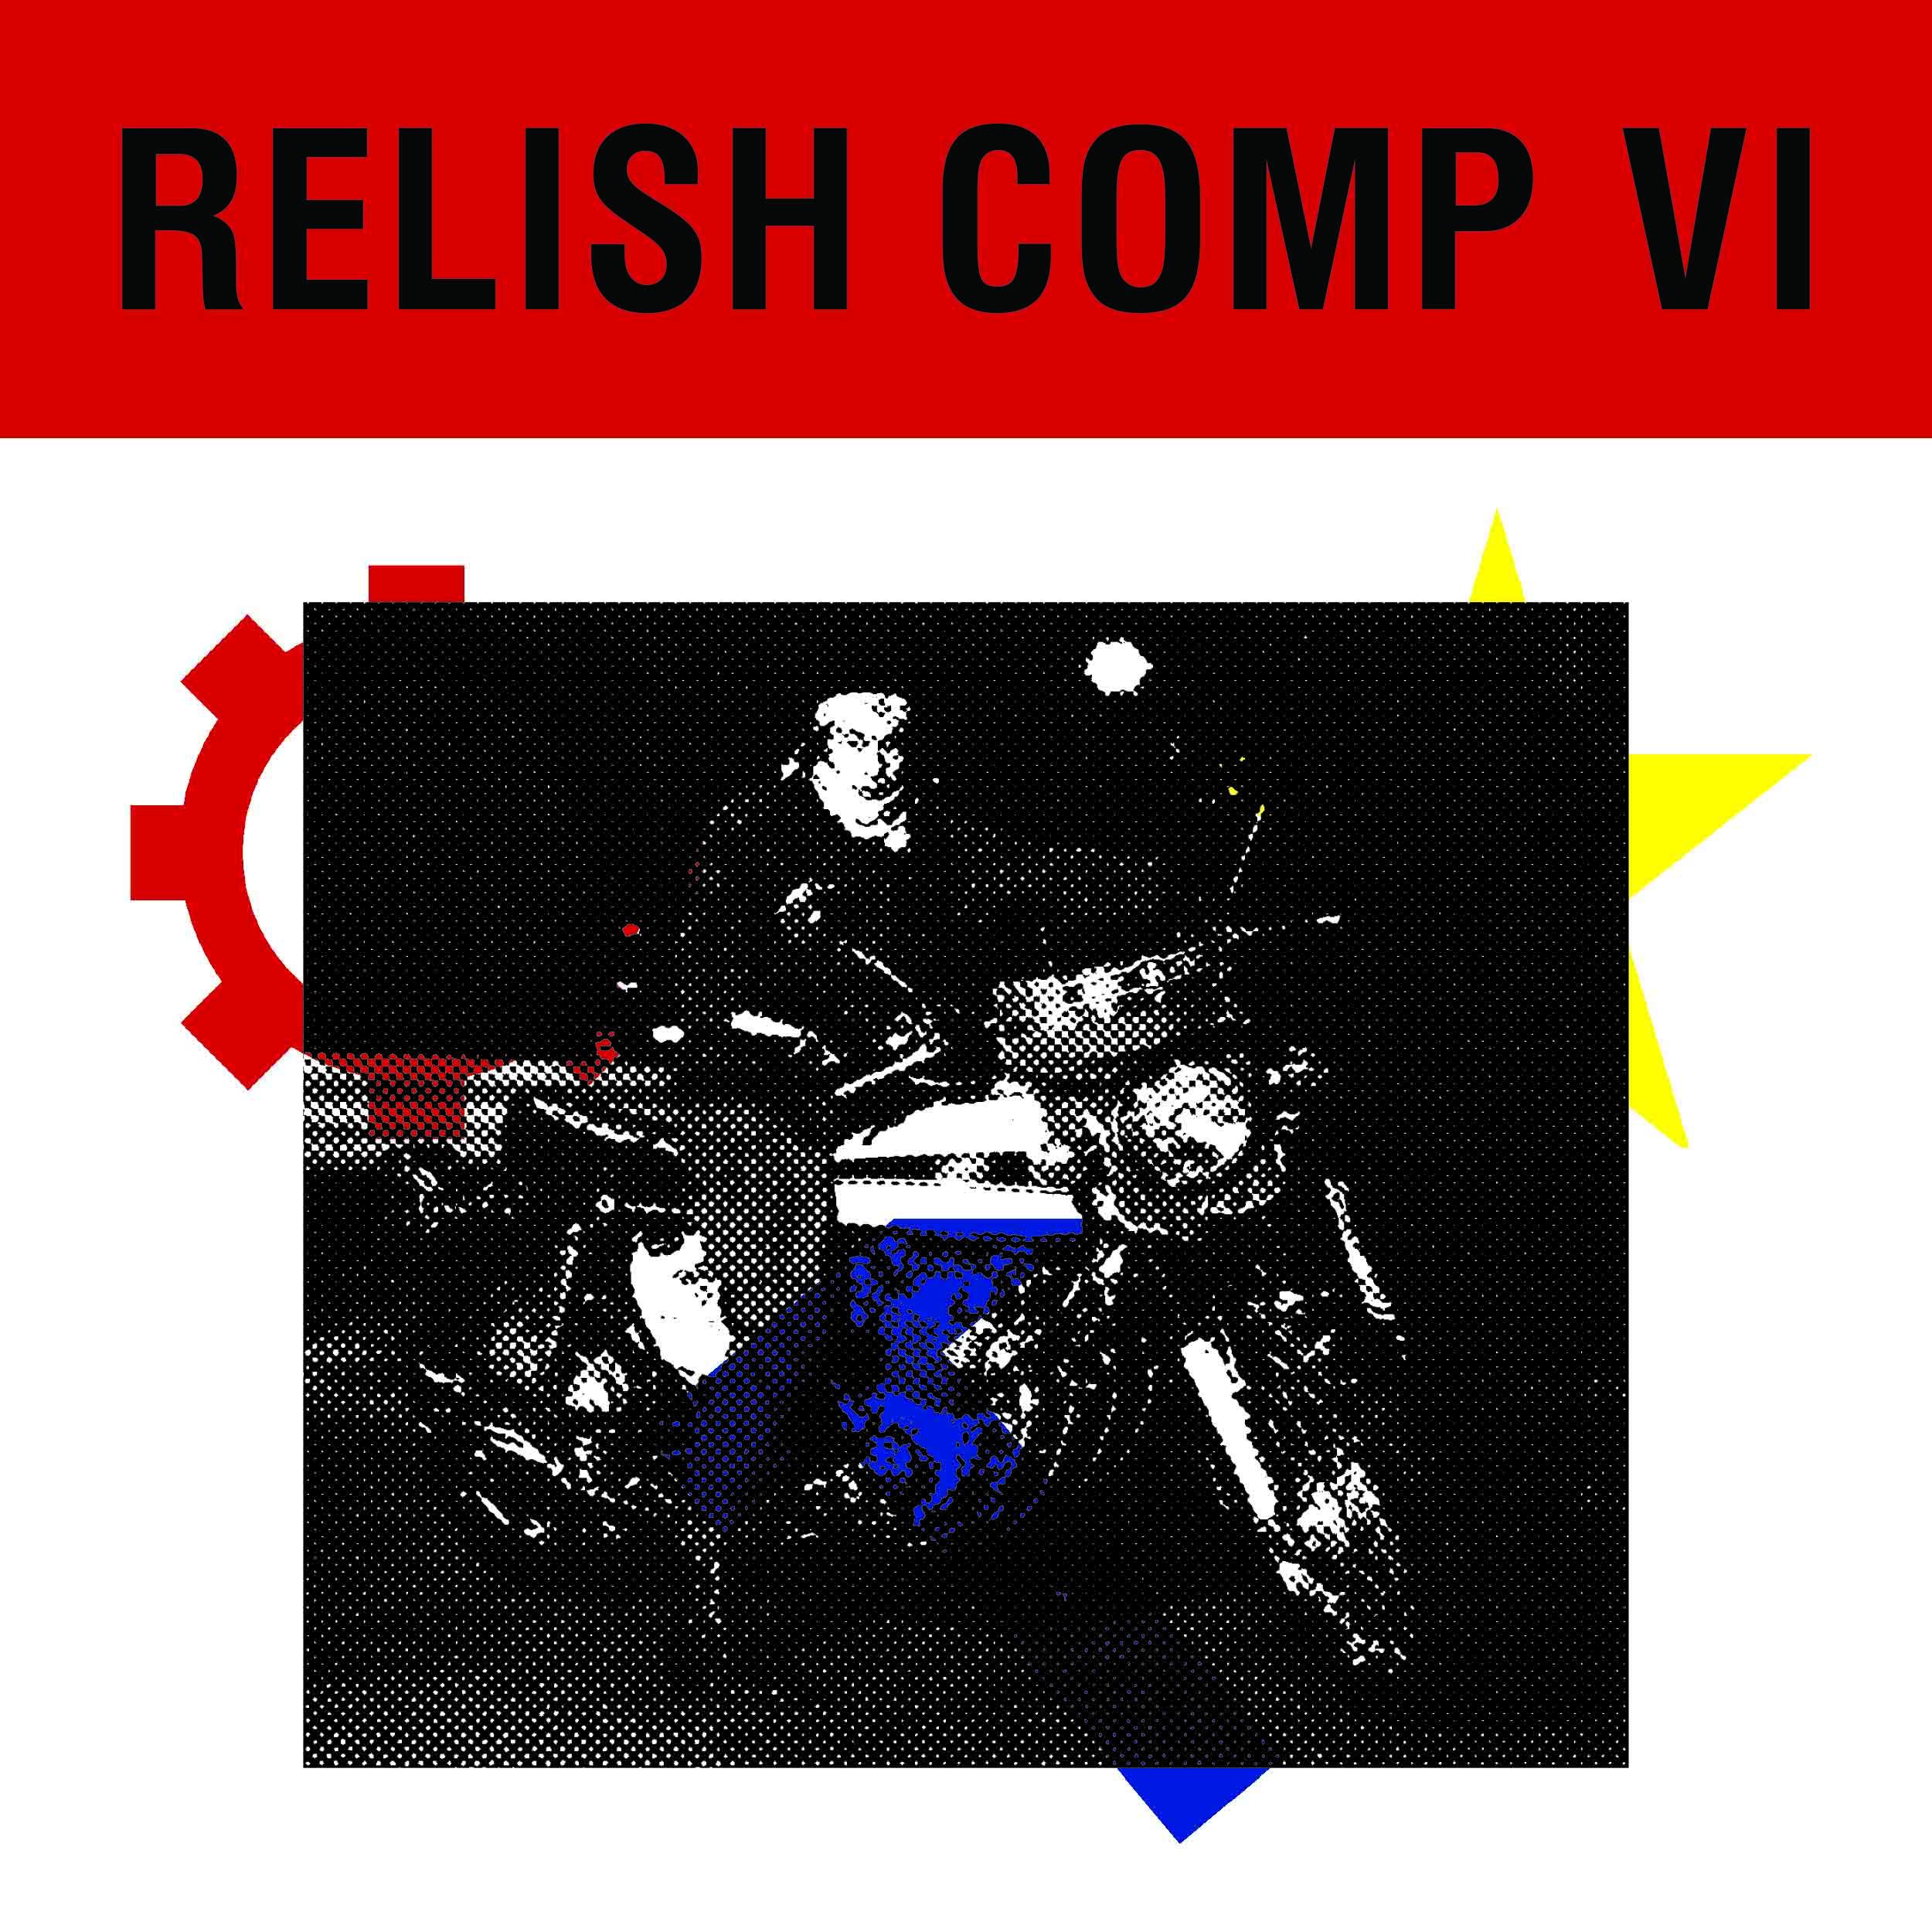 PREMIERE – Justine – Happy House (Robi Insinna Remix) (Relish)